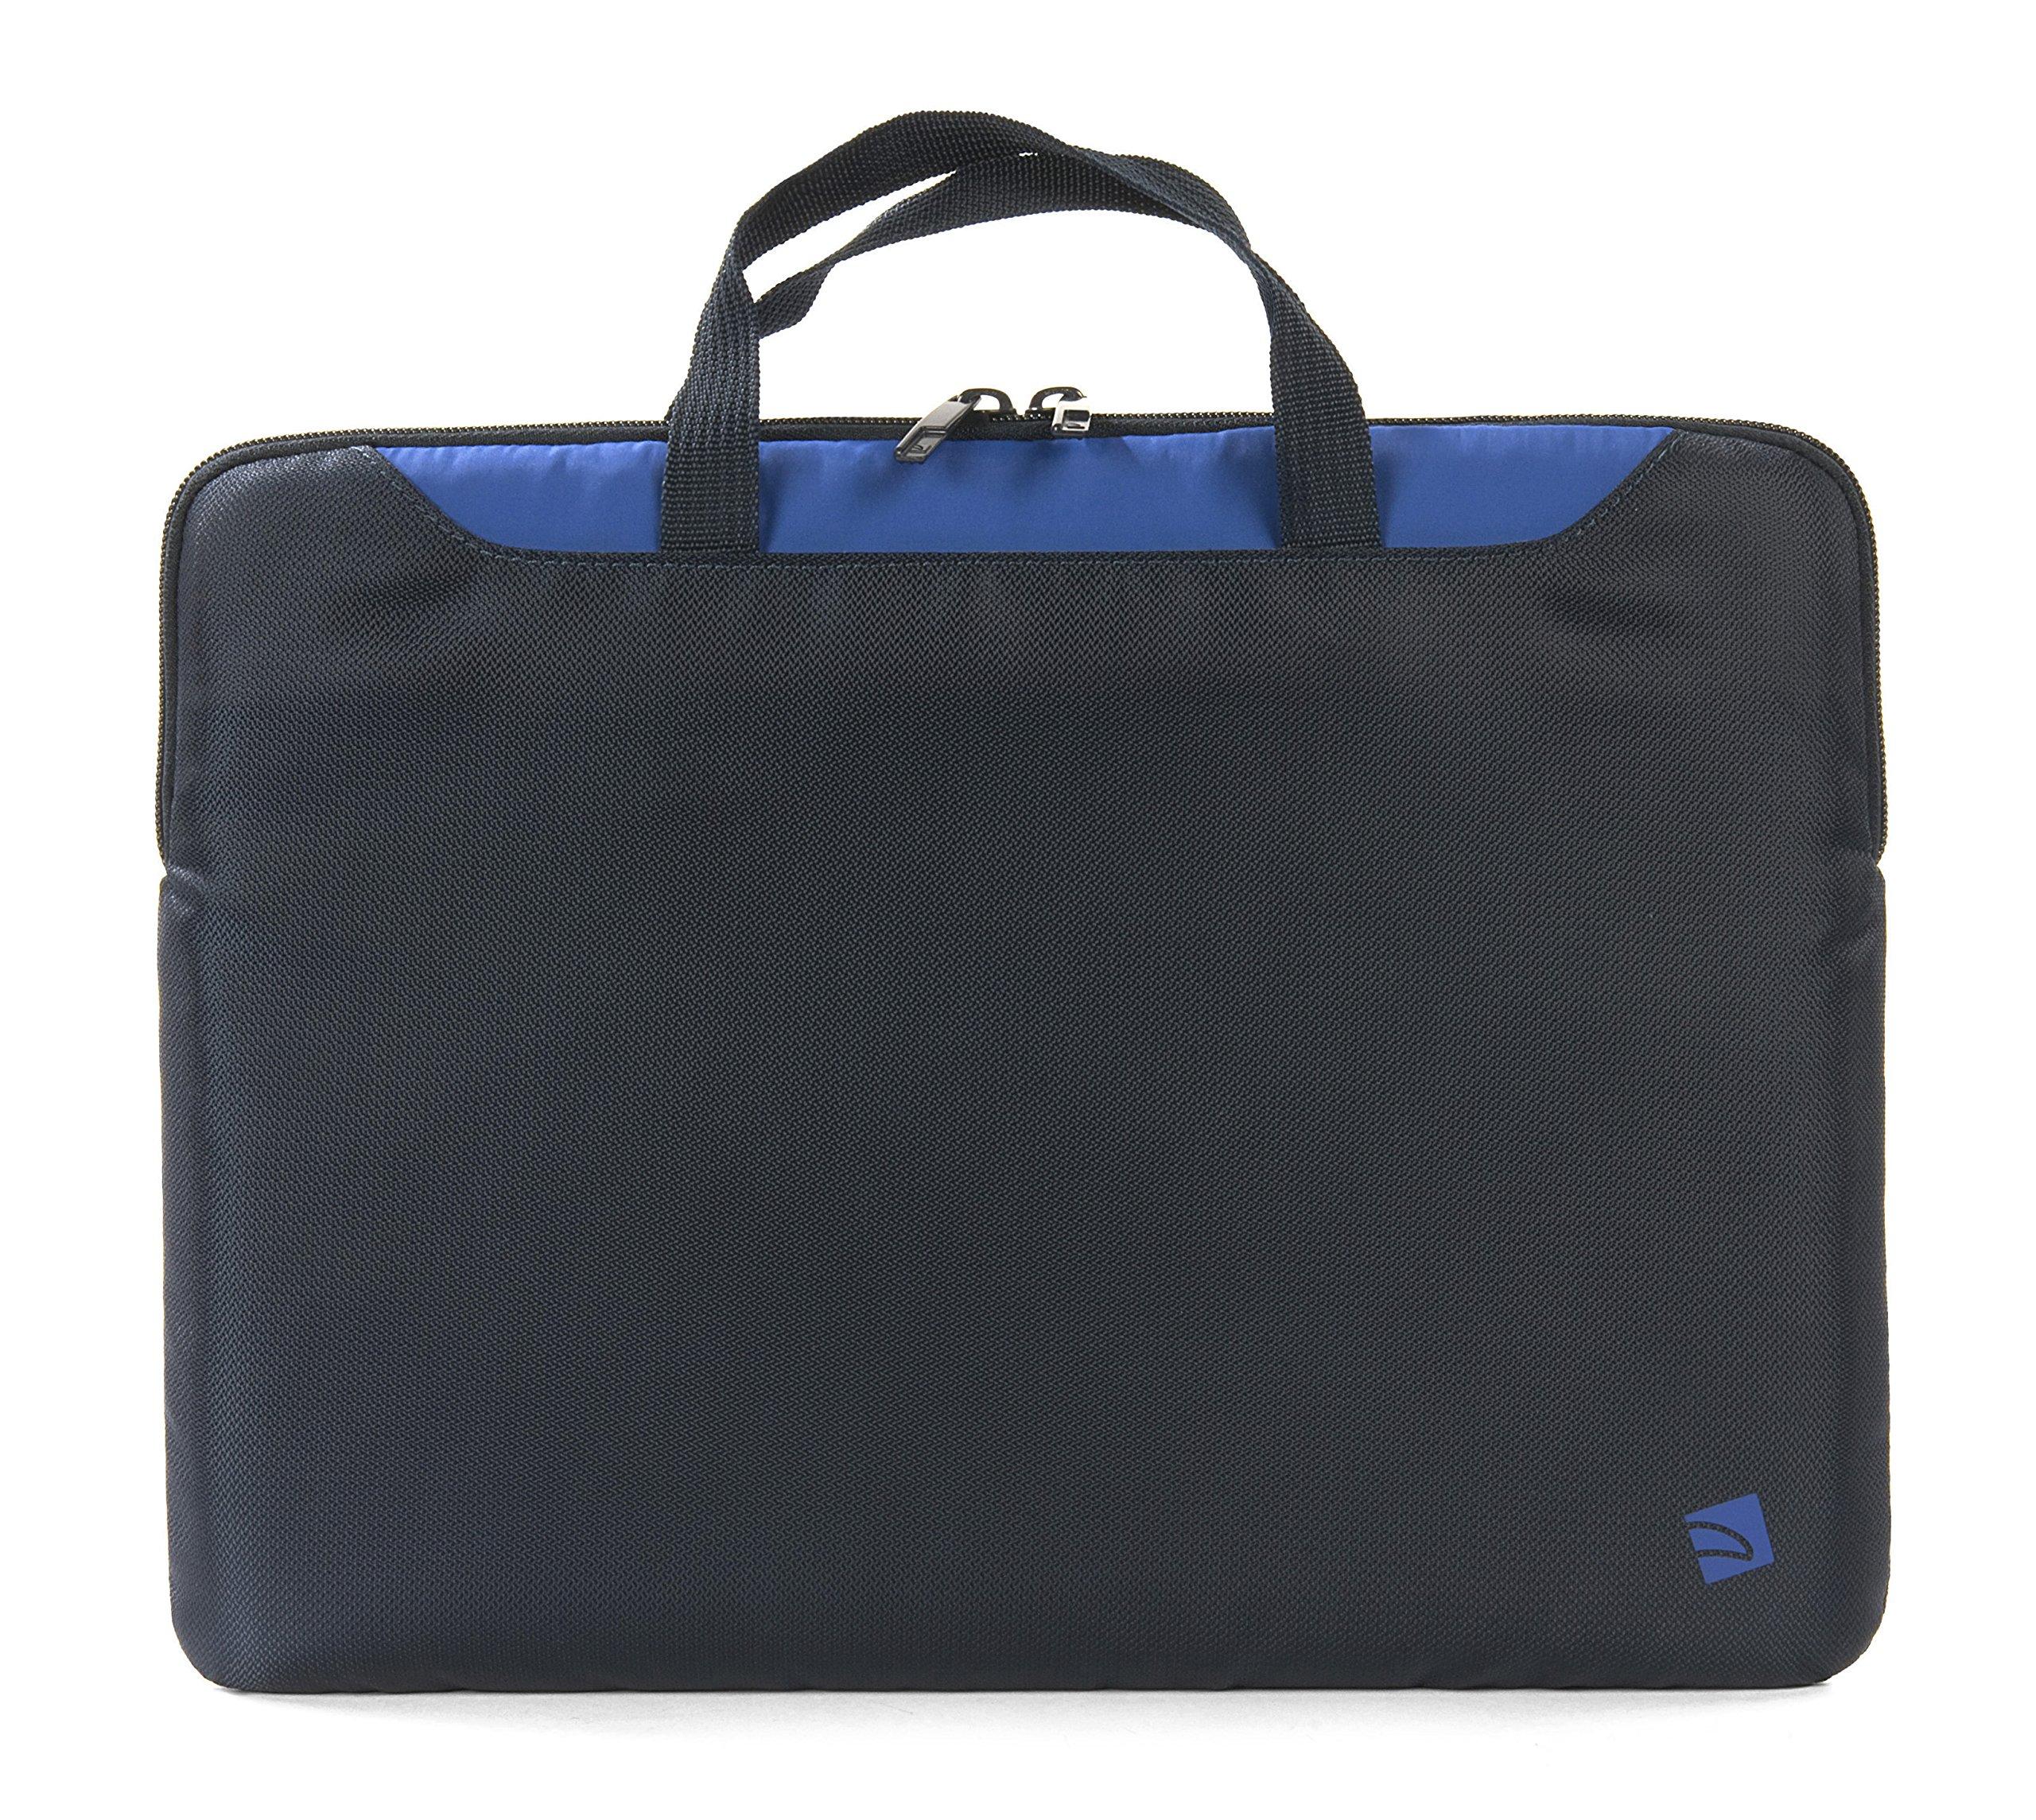 TUCANO BMINI13-B Laptop Computer Bags & Cases